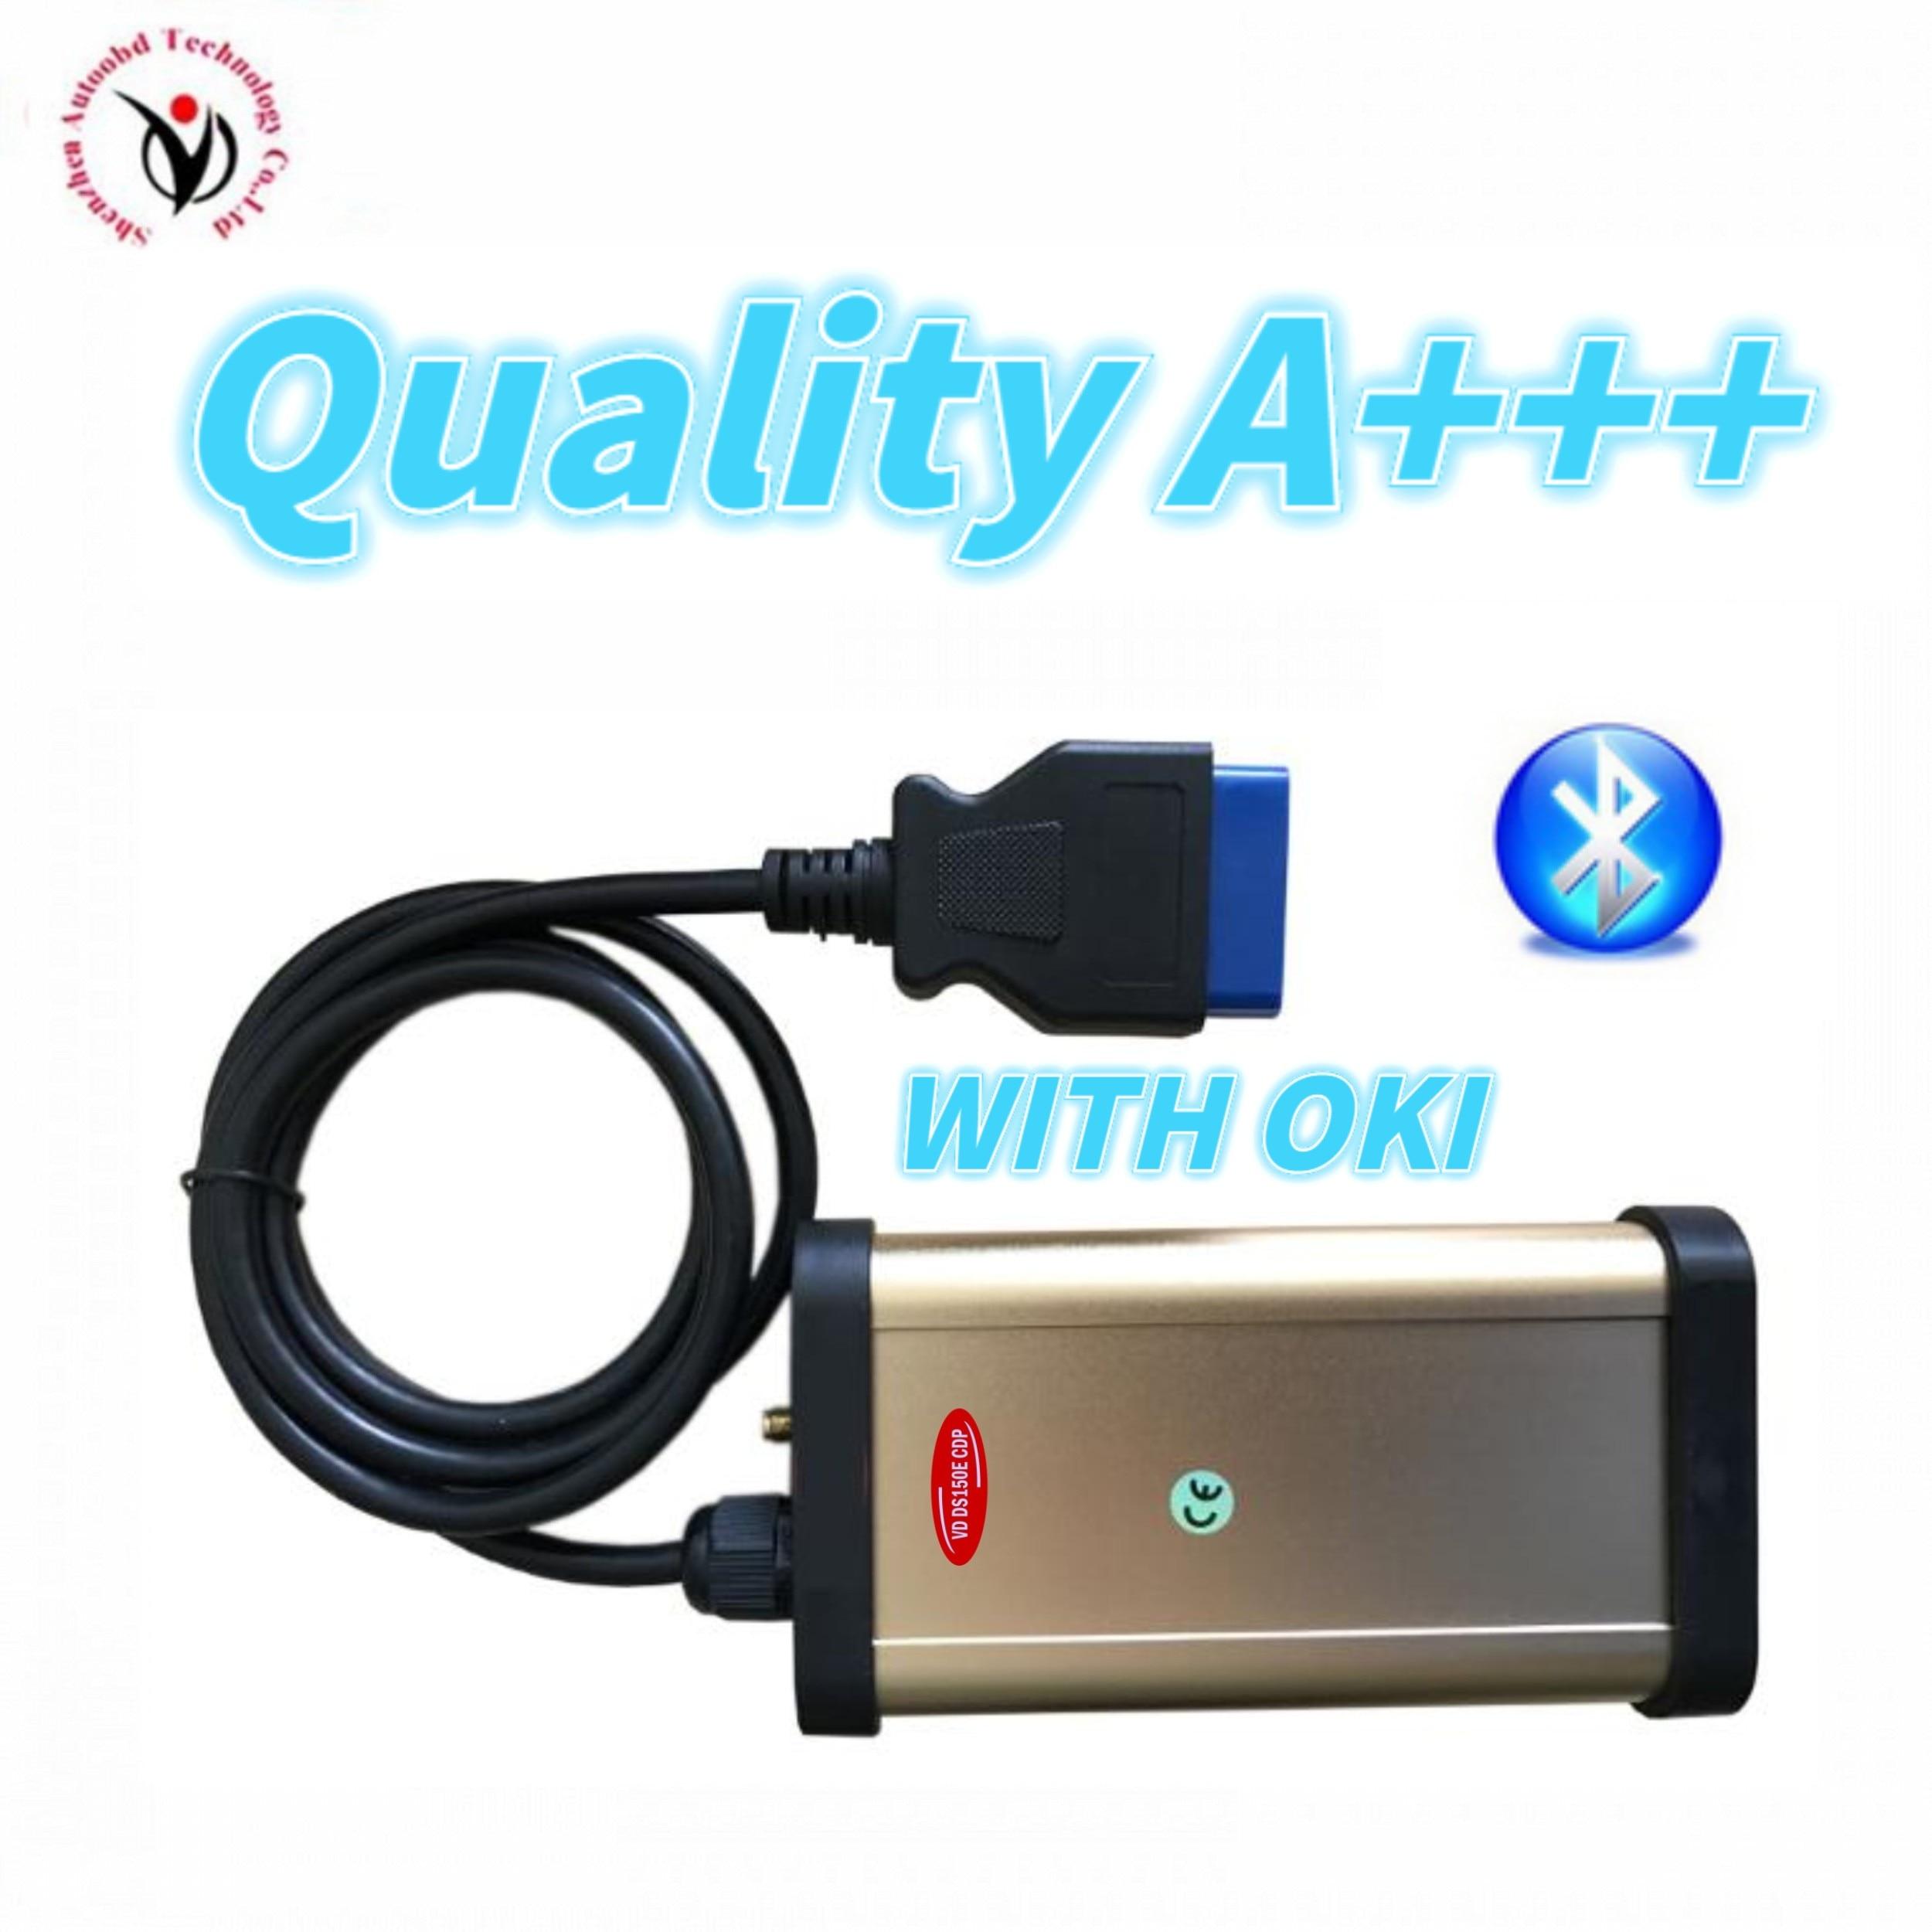 2020 neue Gold form mit OKI CHIP bluetooth vd ds150e cdp für vdijk autocoms pro obd2 obd autos & lkw diagnose werkzeug scanner